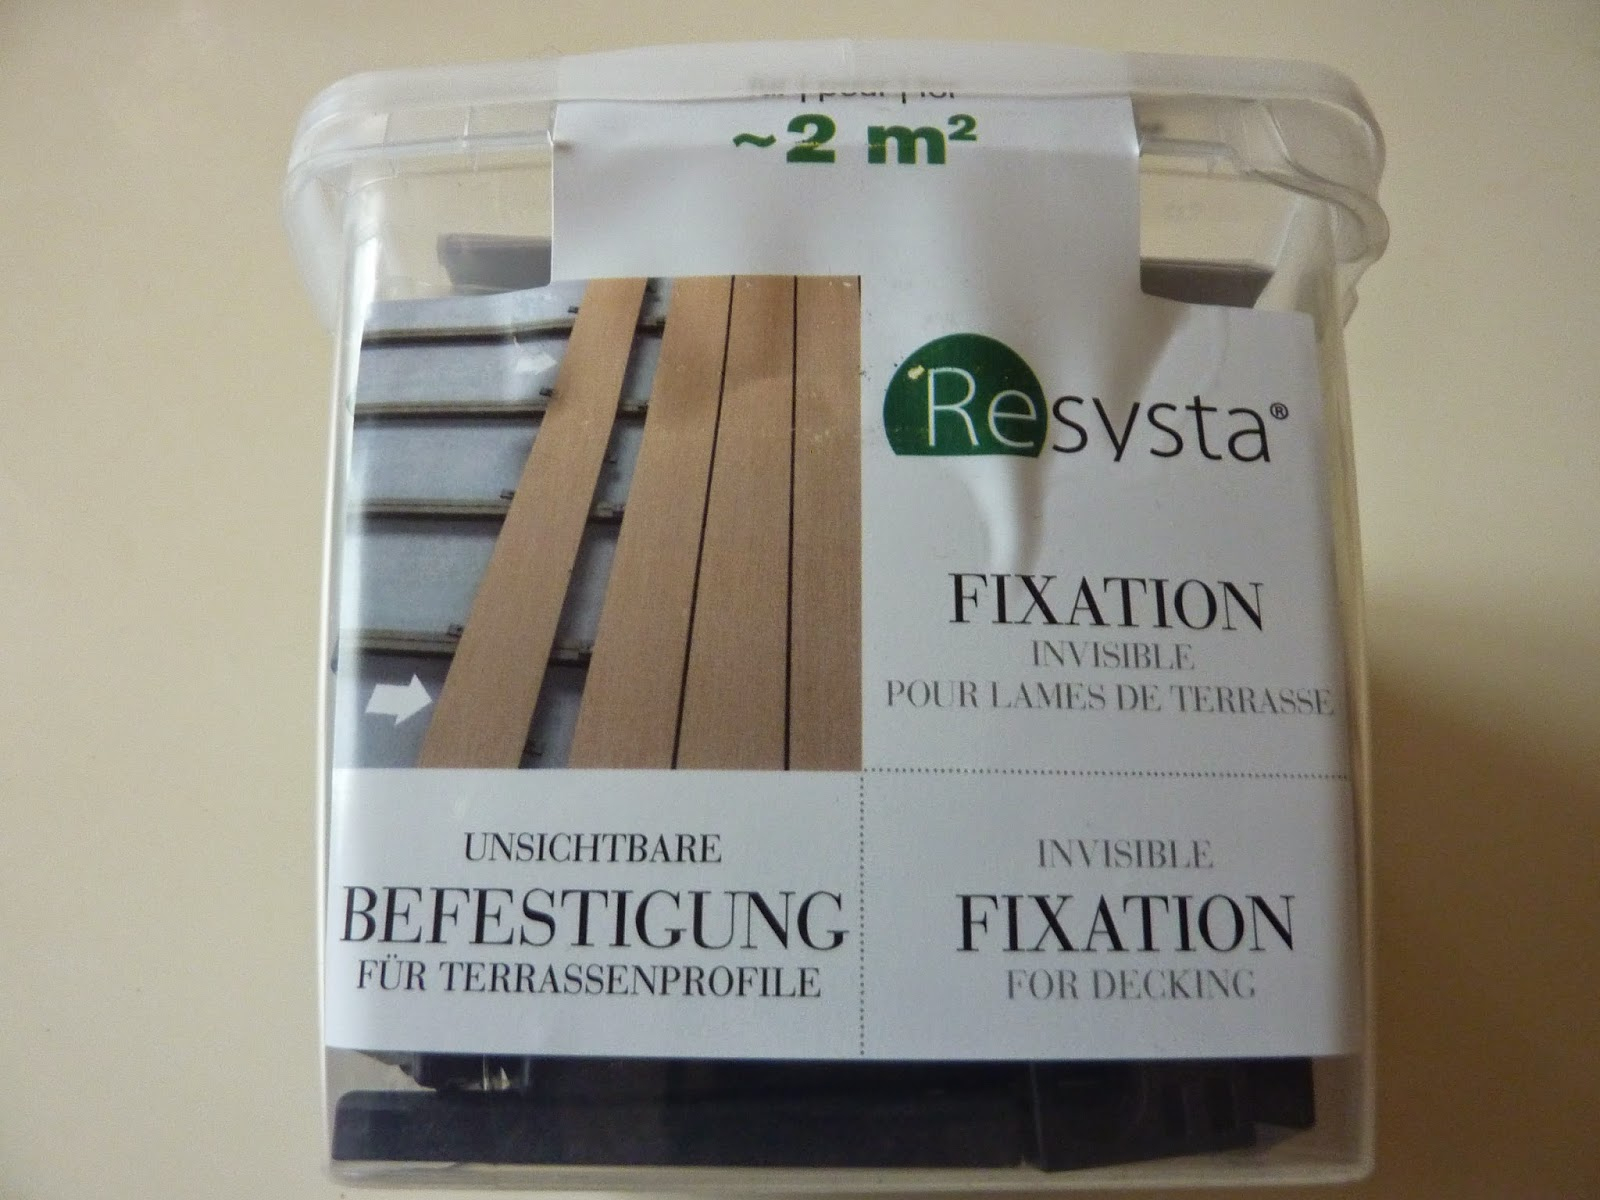 Construire Une Terrasse En Composite: Presentation intérieur Peinture Resysta